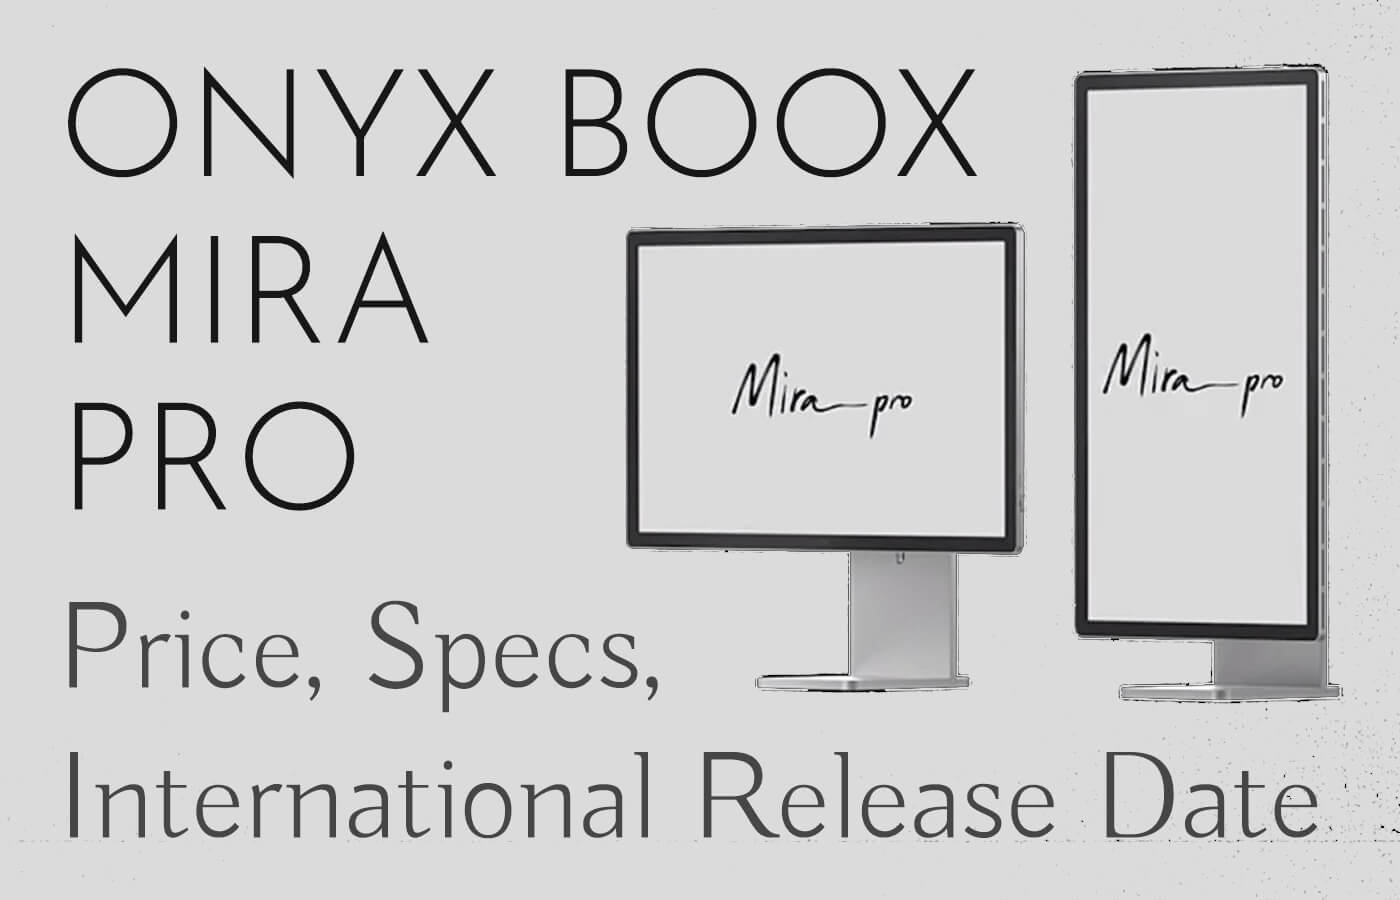 onyx boox mira pro eink monitor price